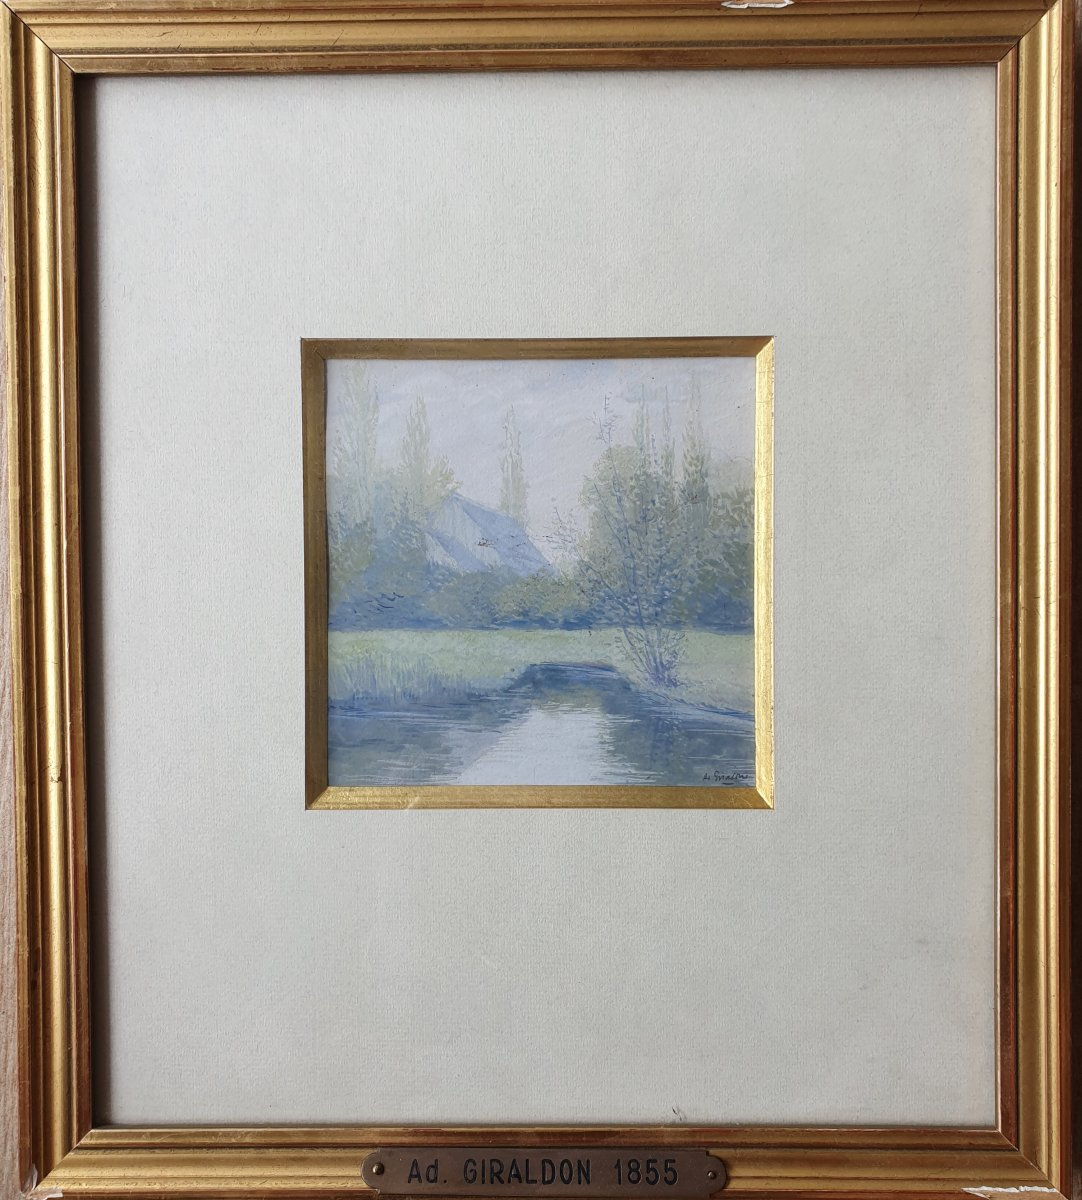 Adolphe Giraldon 1855 - 1933 Aquarelle Briquemault 1922